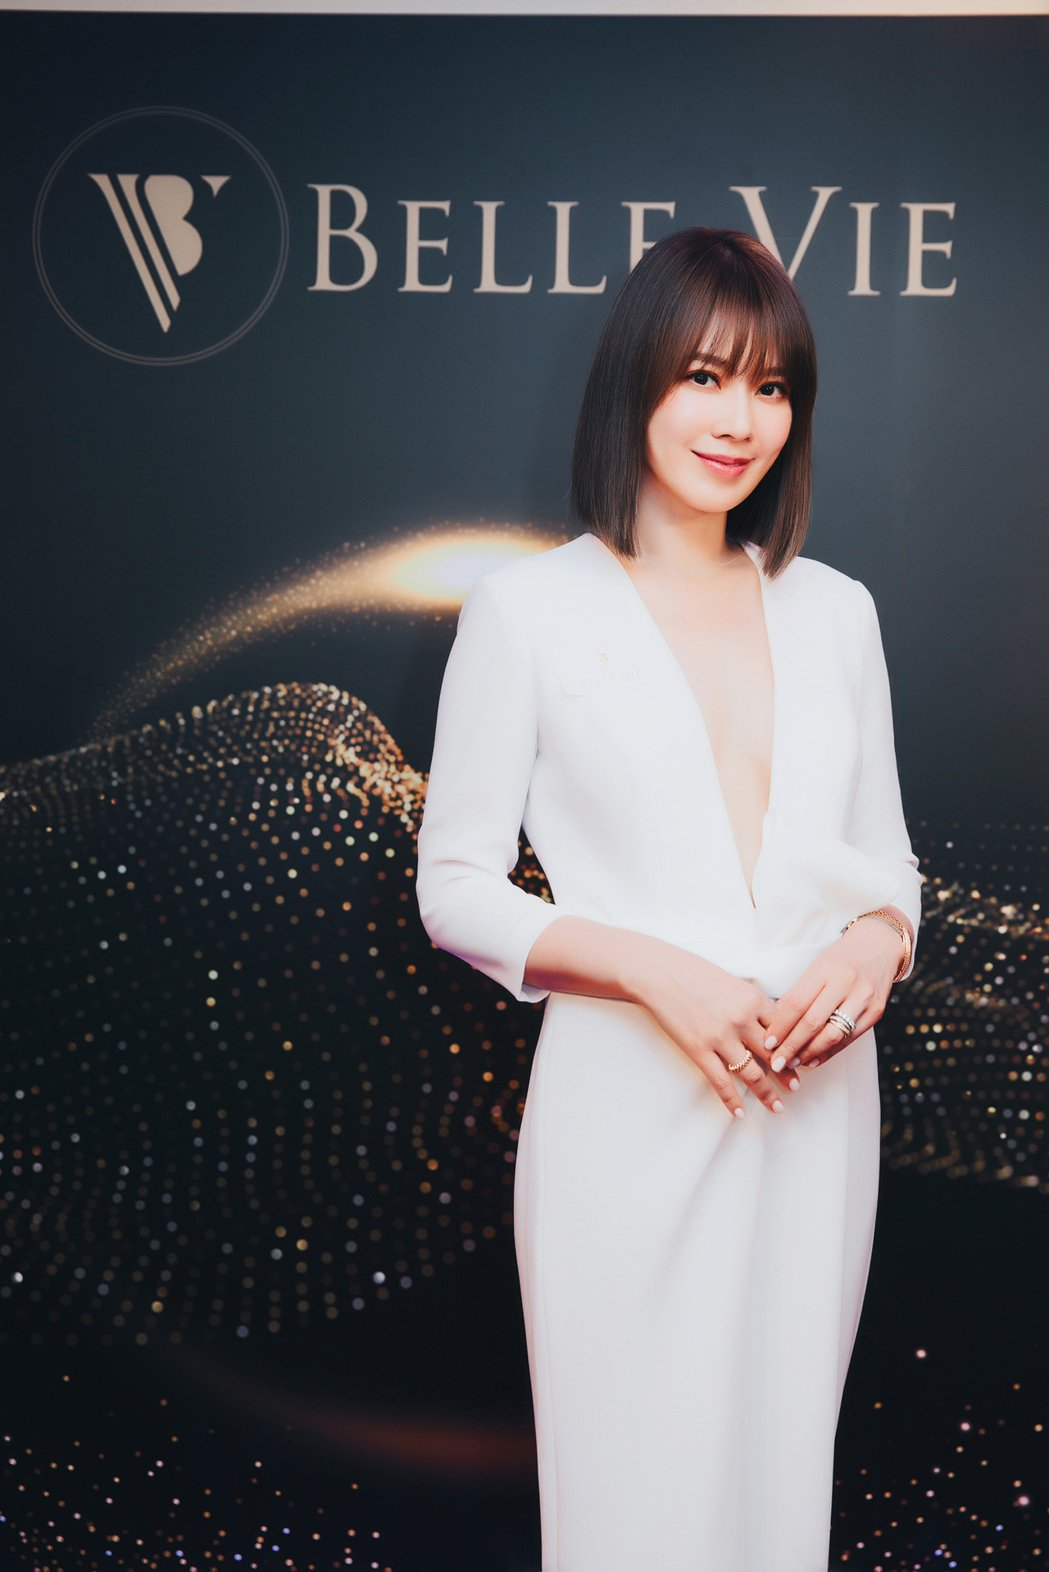 Melody出席Belle Vie細胞抗衰spa館開幕活動。圖/Belle vi